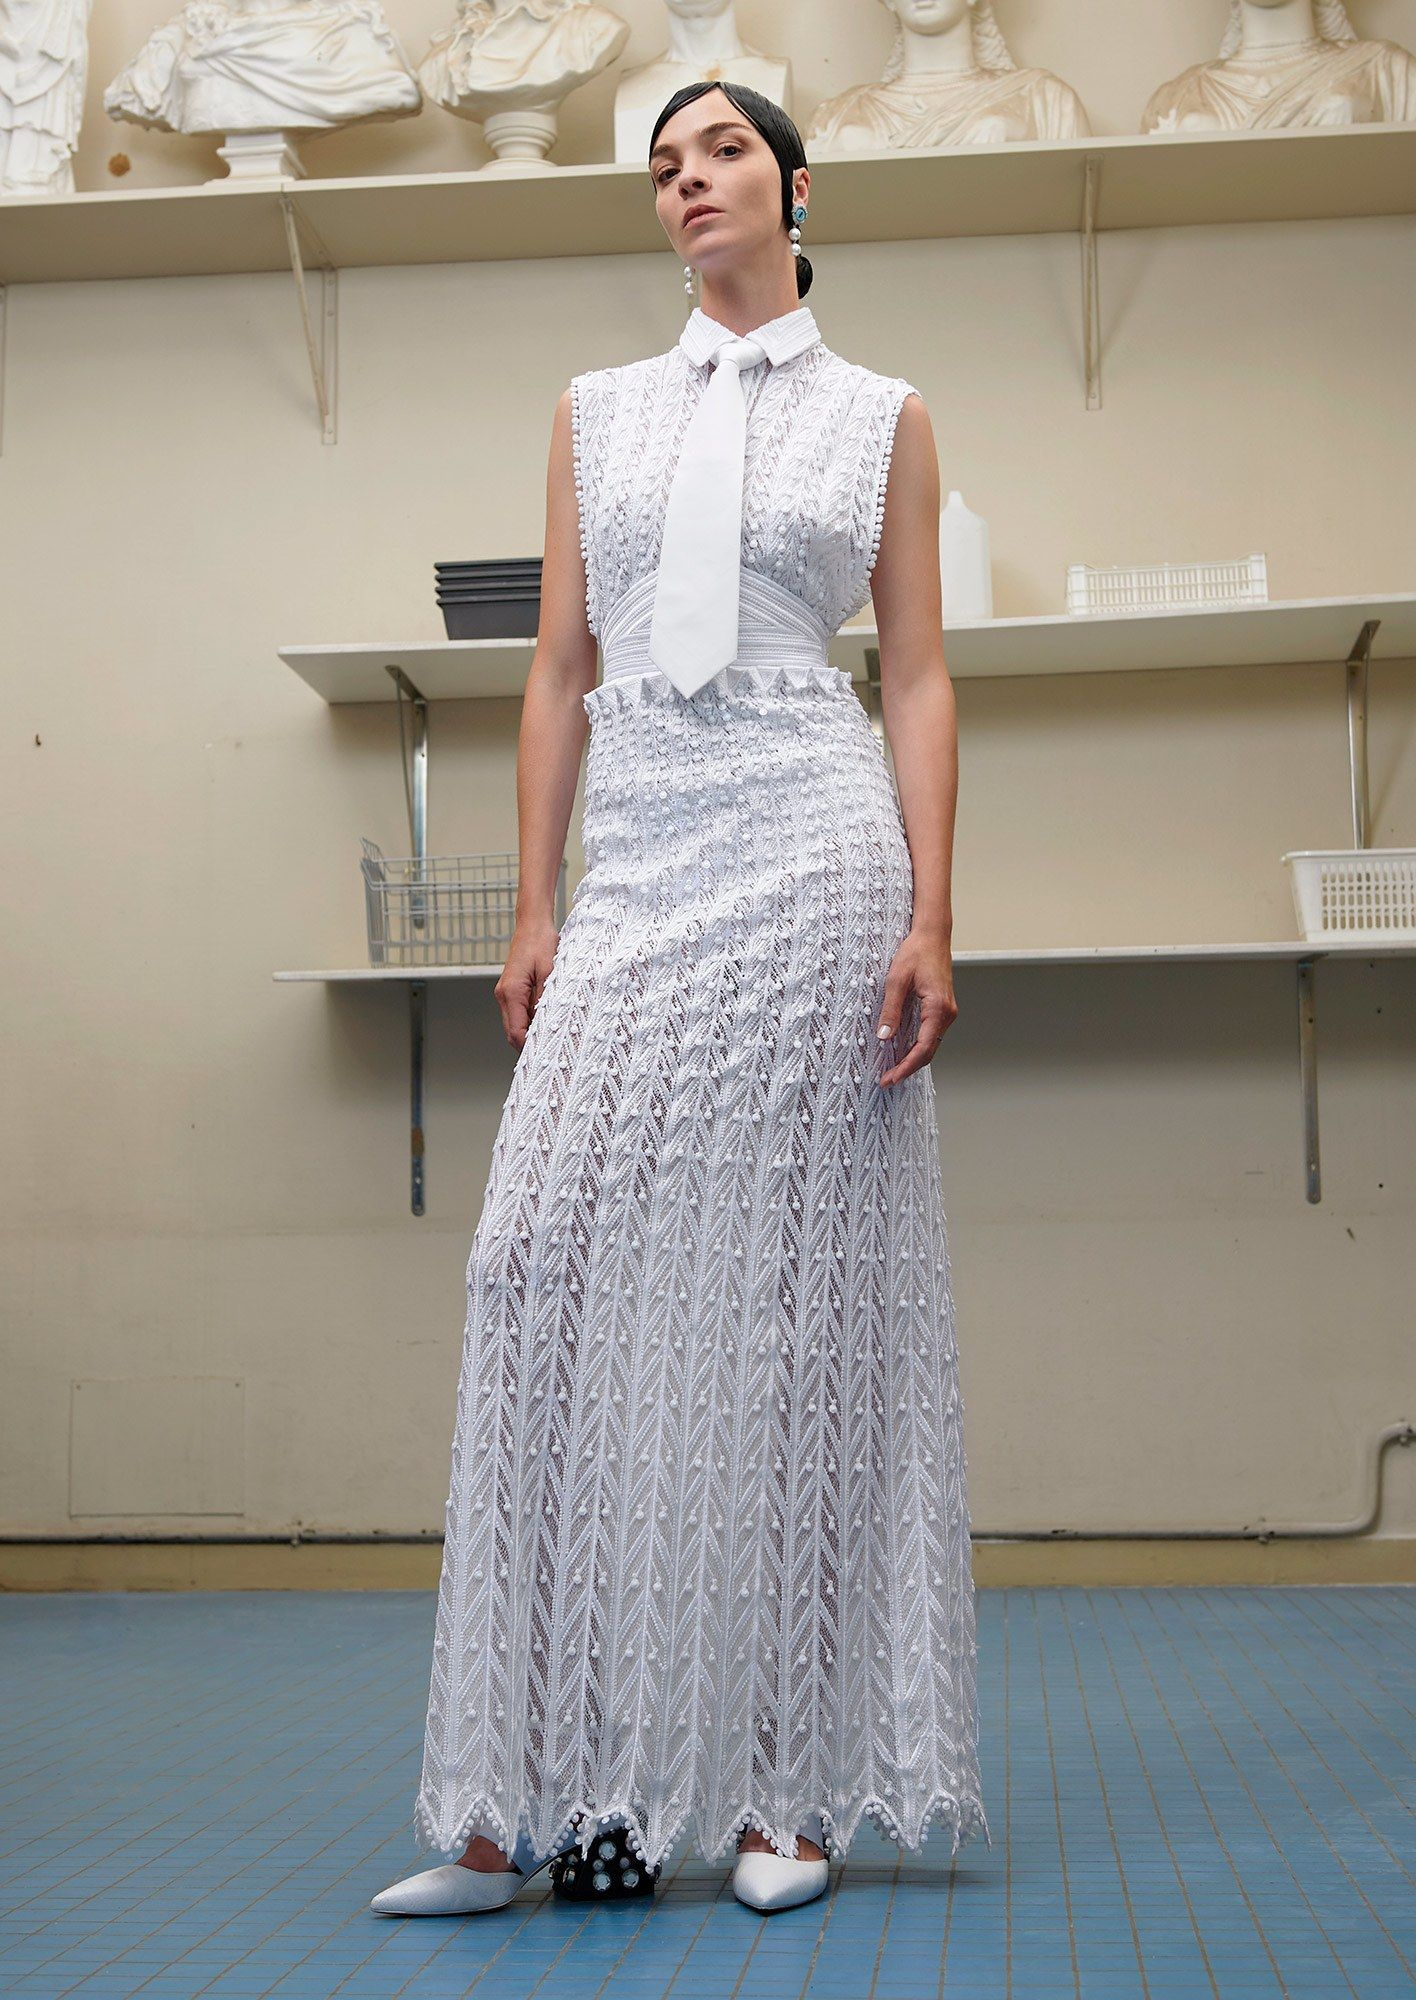 Givenchy Fall 2016 Couture Fashion Show - Mariacarla Boscono (Viva)